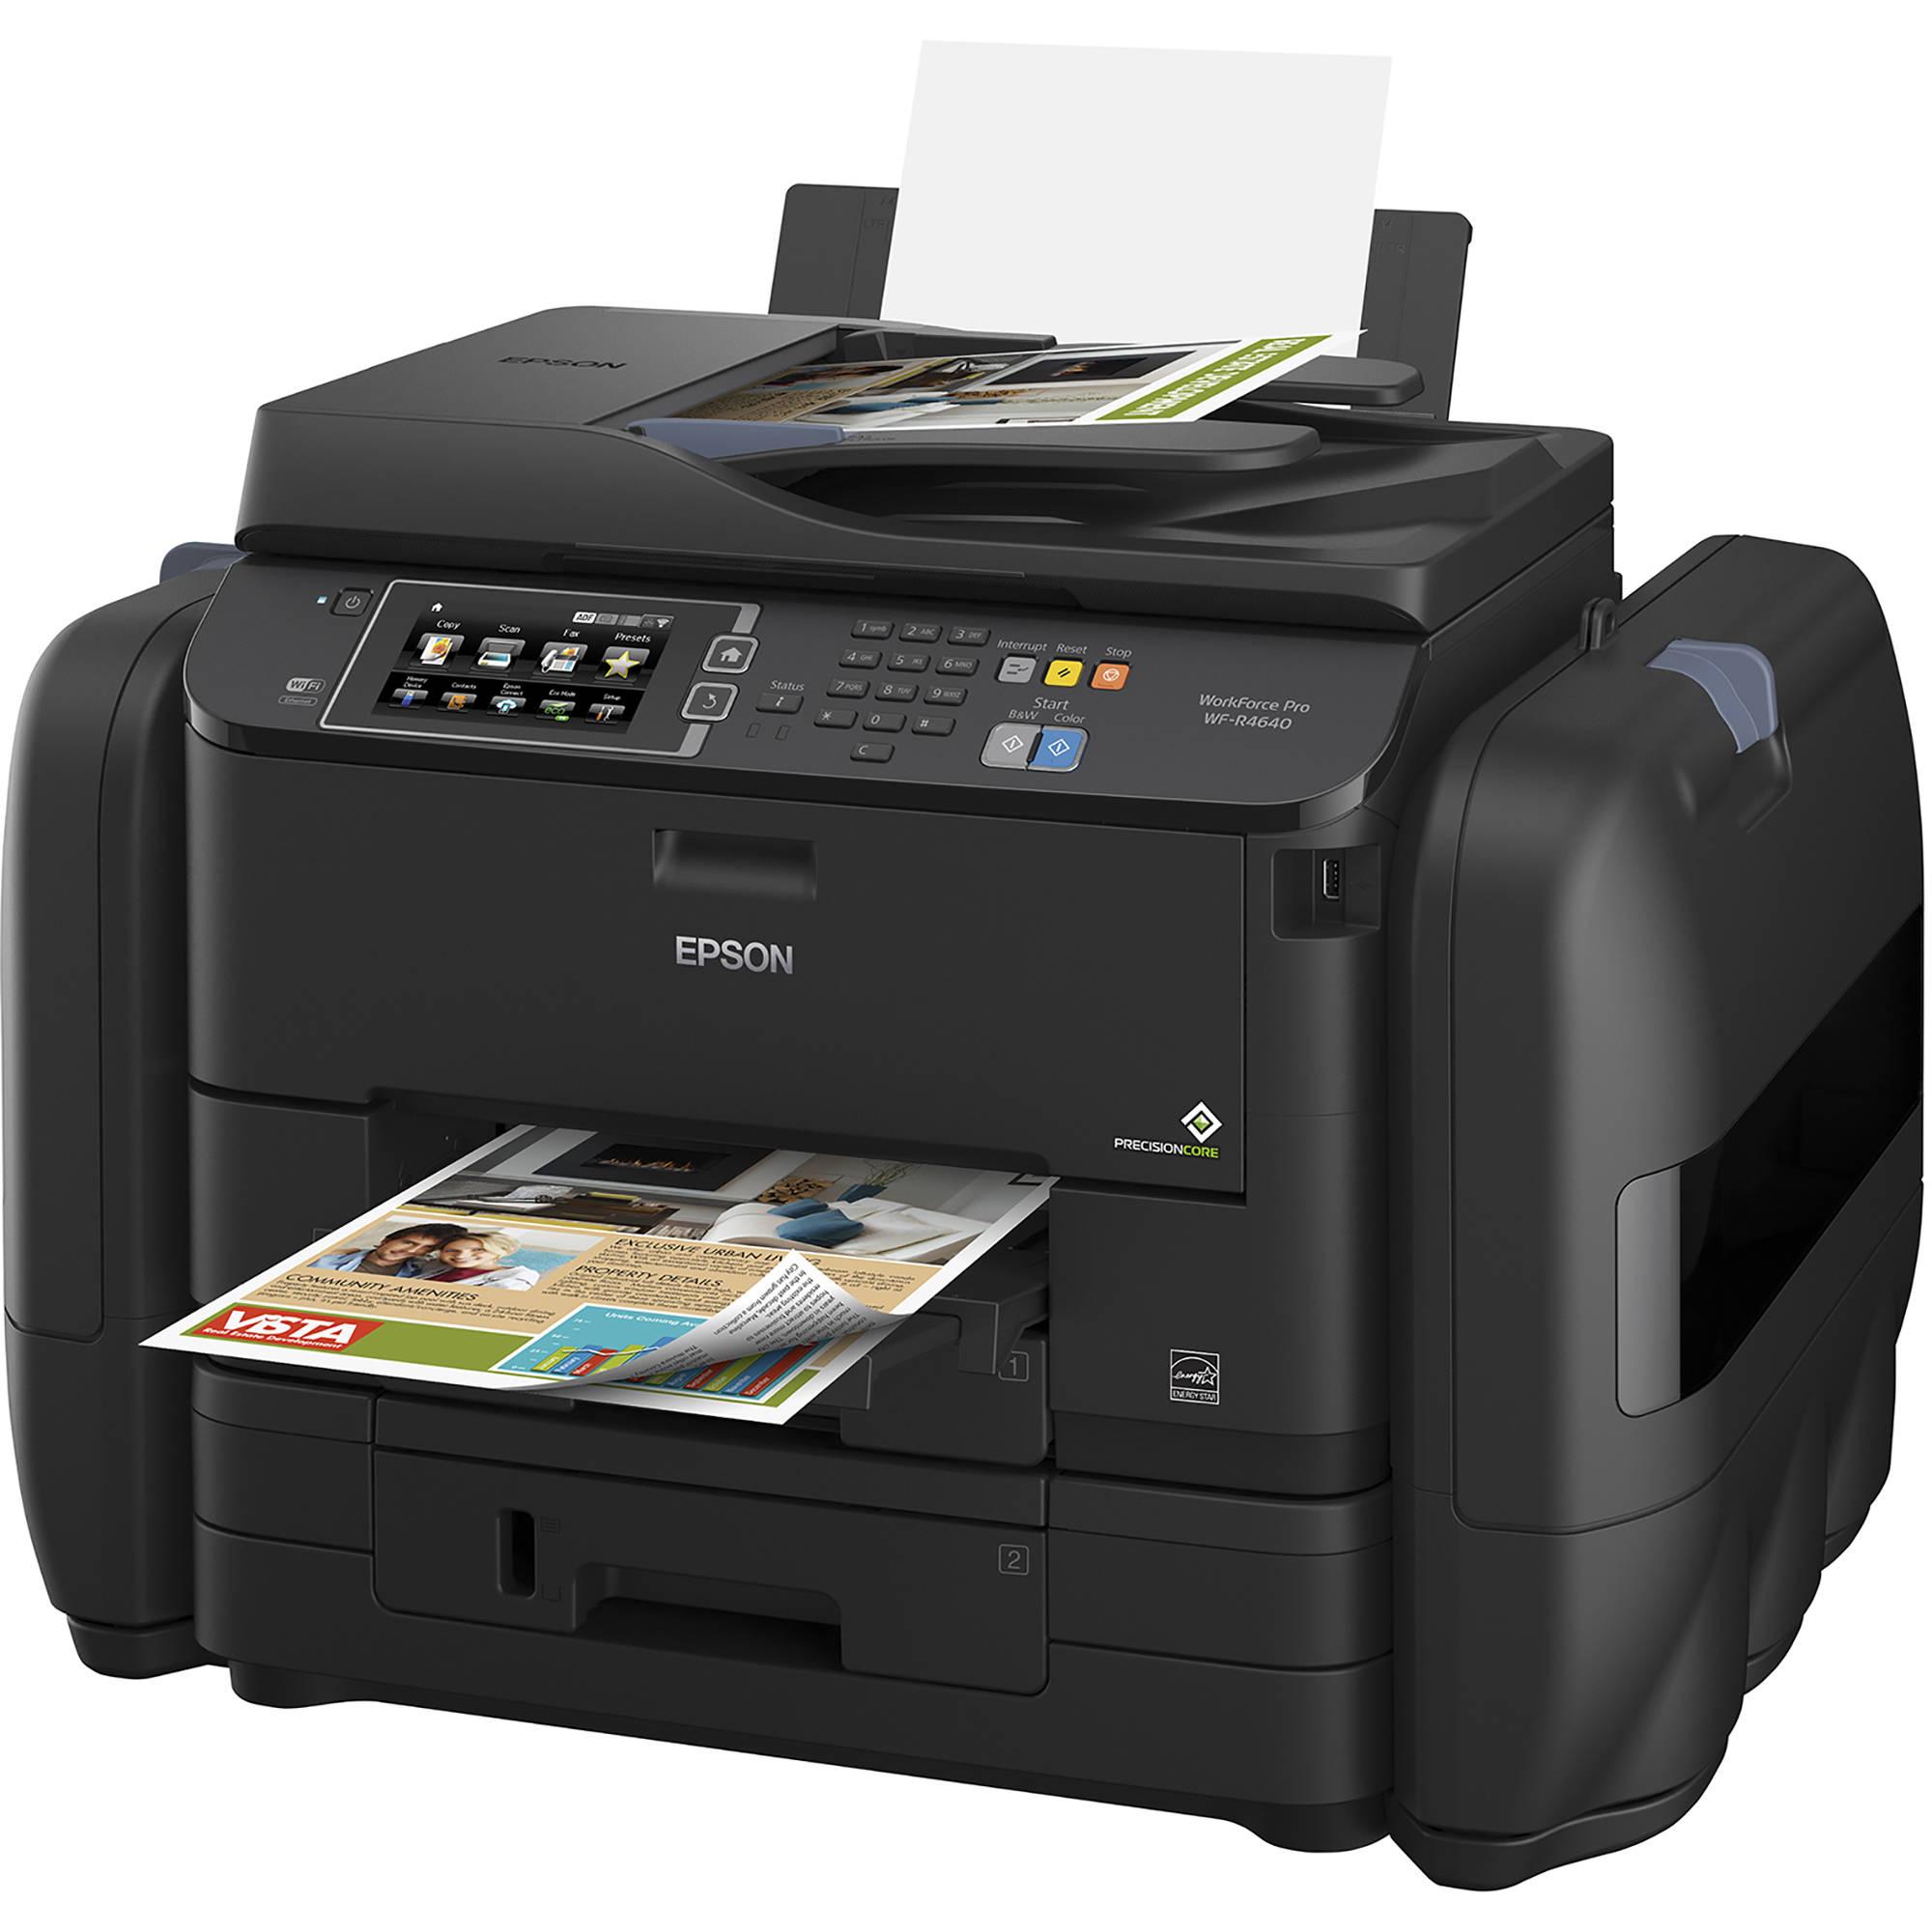 Cake Pro Printer